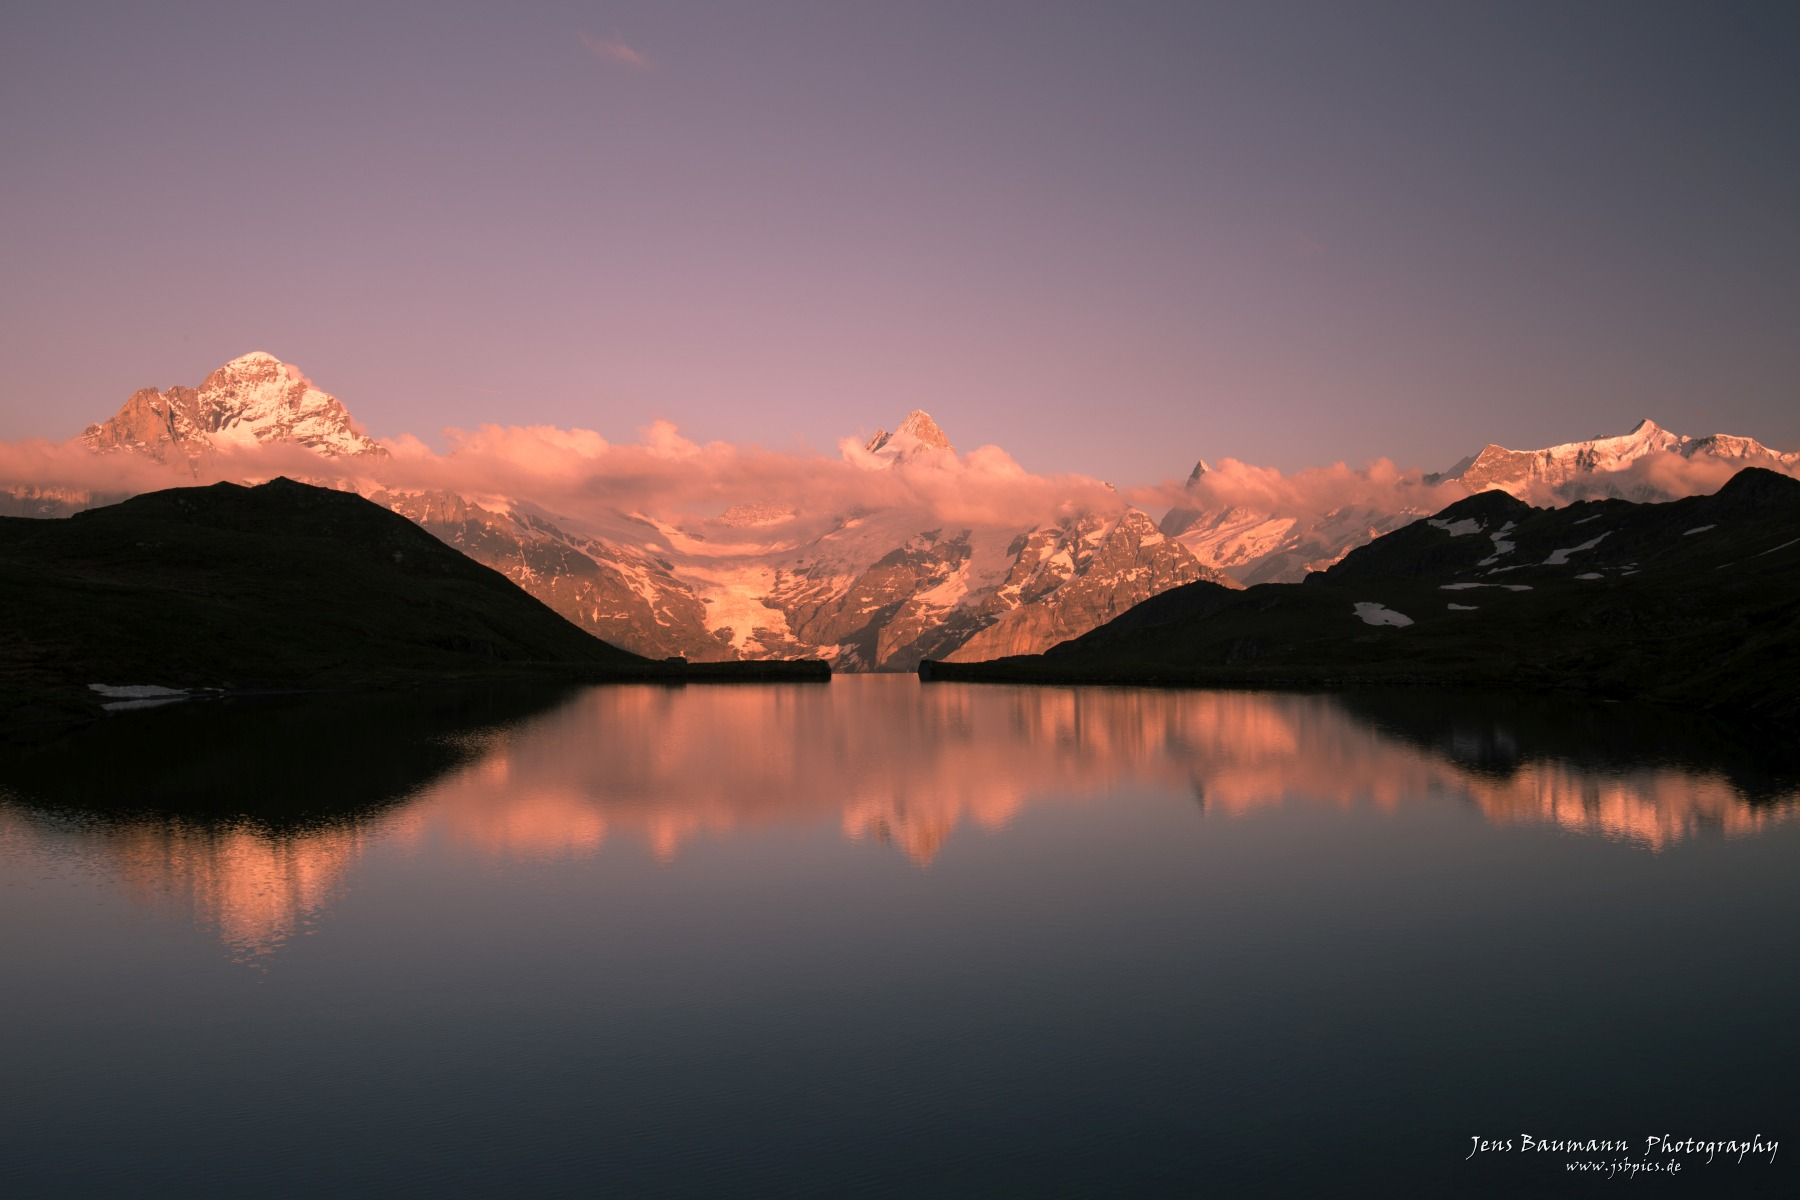 Sunset at Bachalpsee